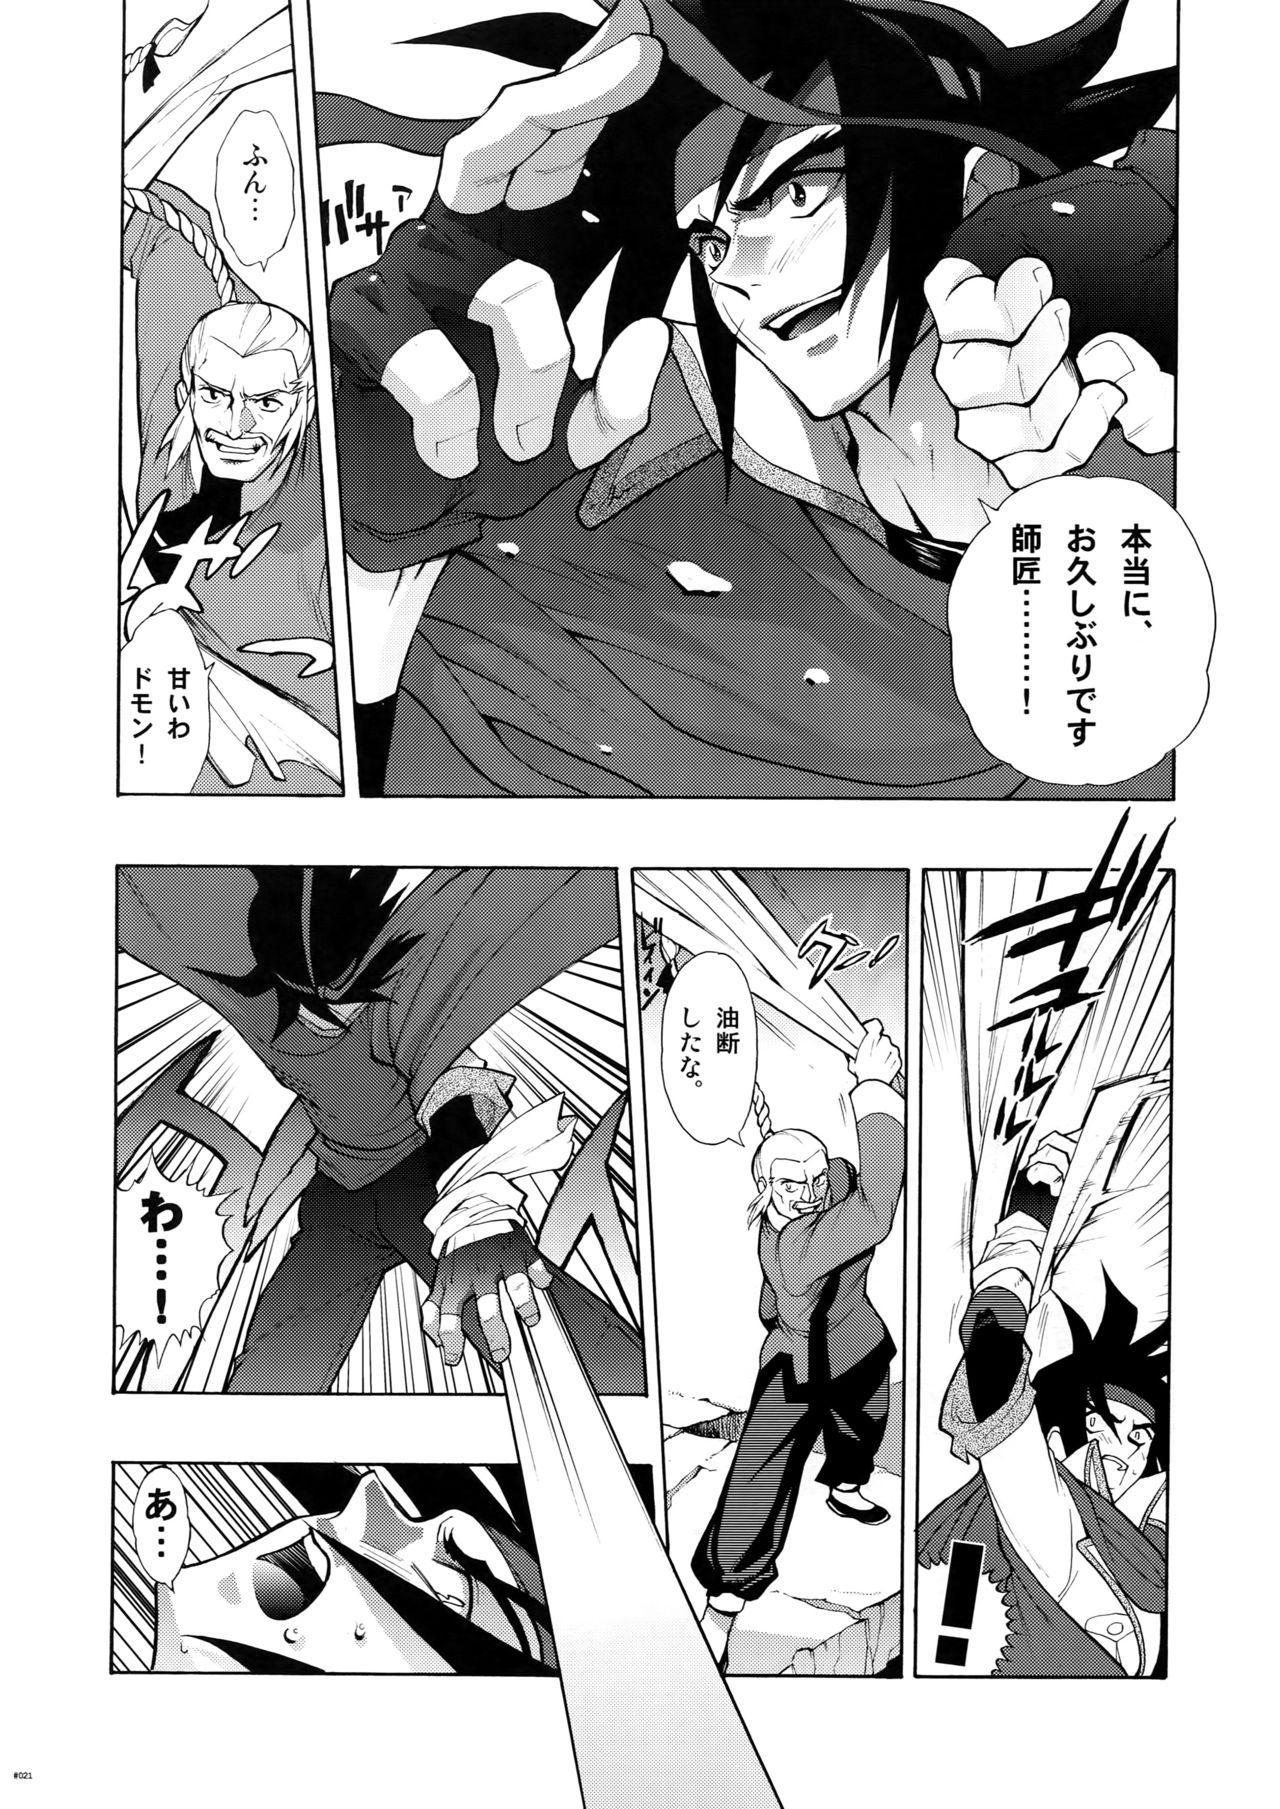 [Article 60 of Criminal Code (Shuhan)] G-gan Josei-Muke Sairoku-Shuu (G Gundam) 20